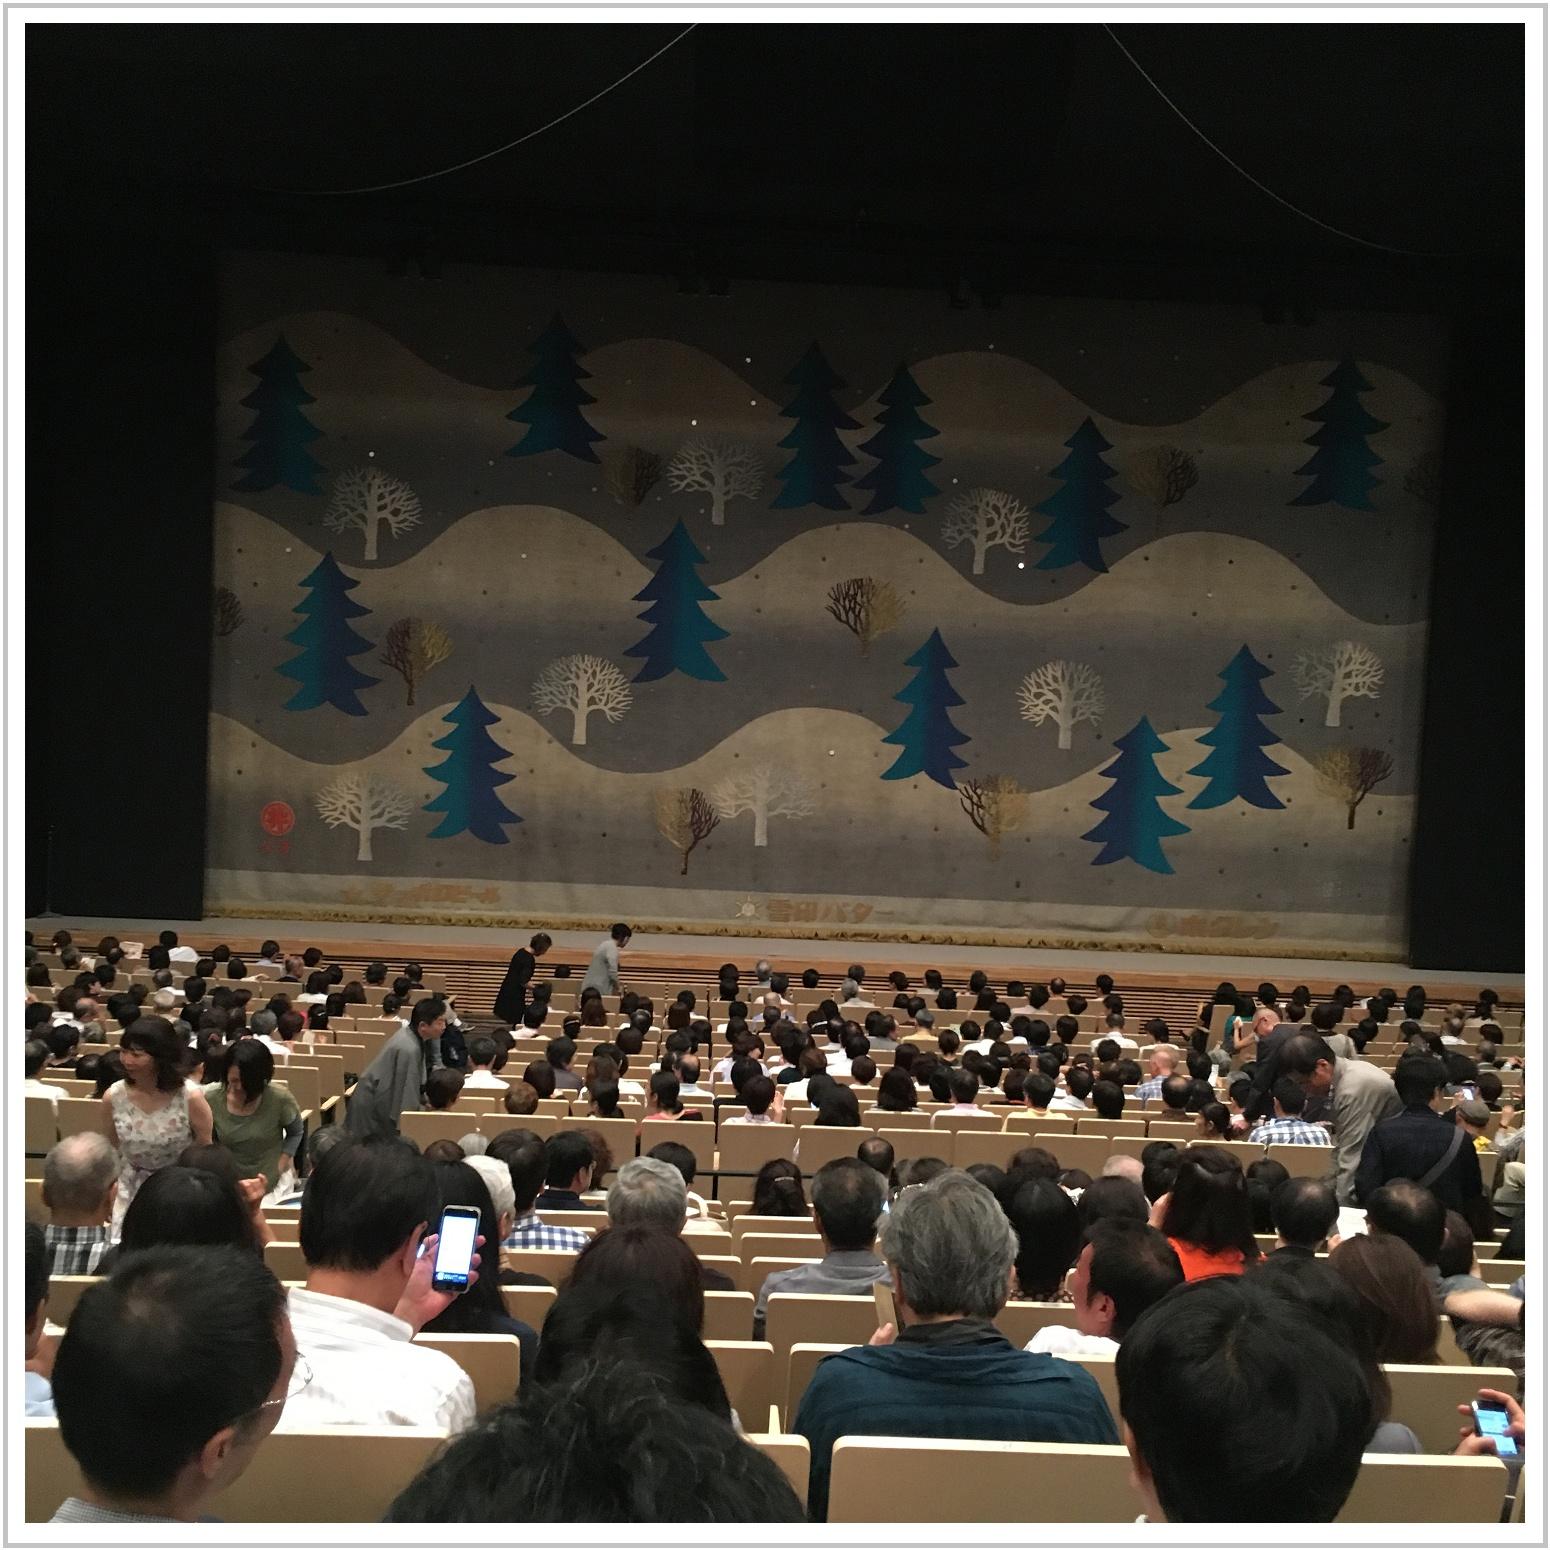 shinosuke_2_722.jpg